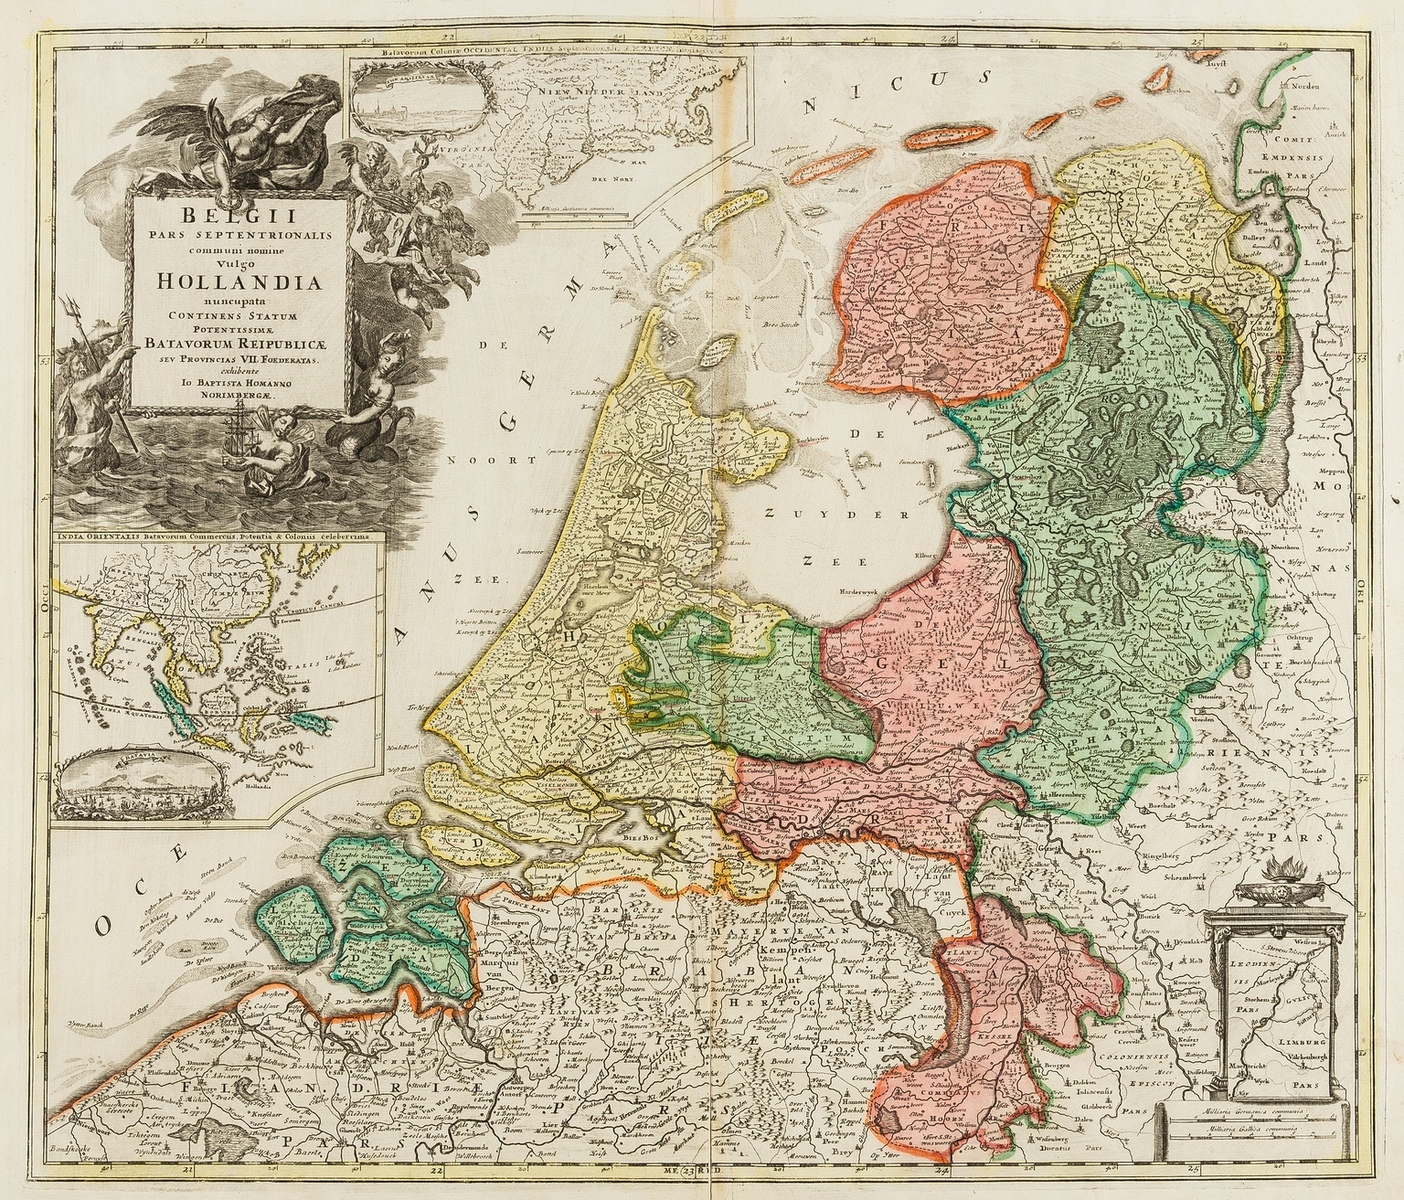 Netherlands.- Homann (Johann Baptist) Belgii Pars Septentrionalis Communi Nominee Vulgo Hollandia, …